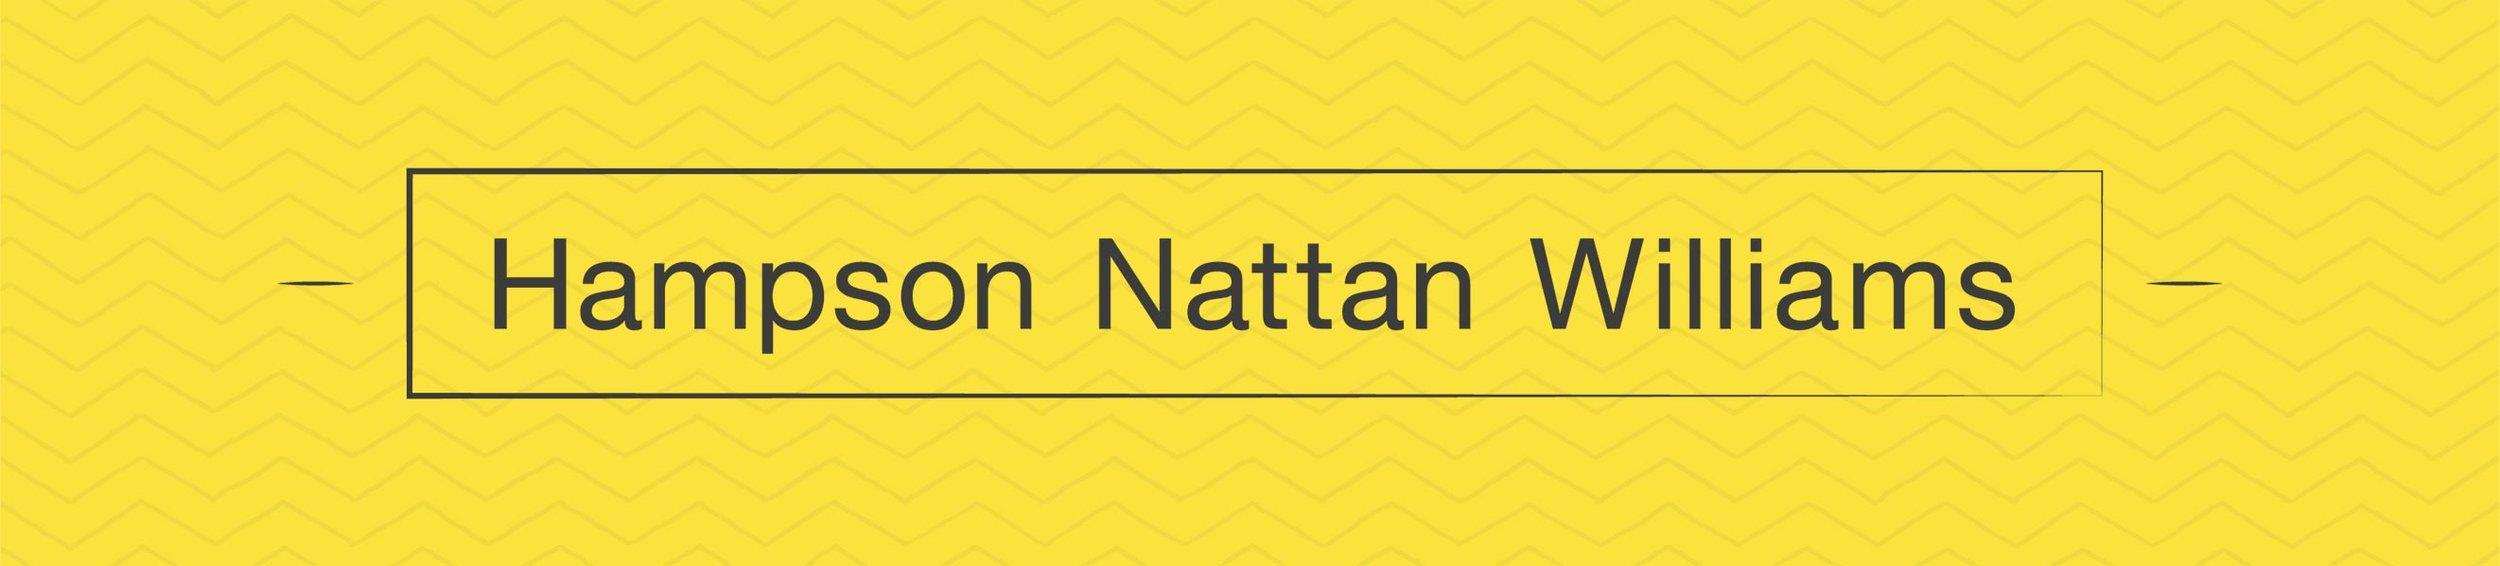 hnw-yellow-landscape.jpg